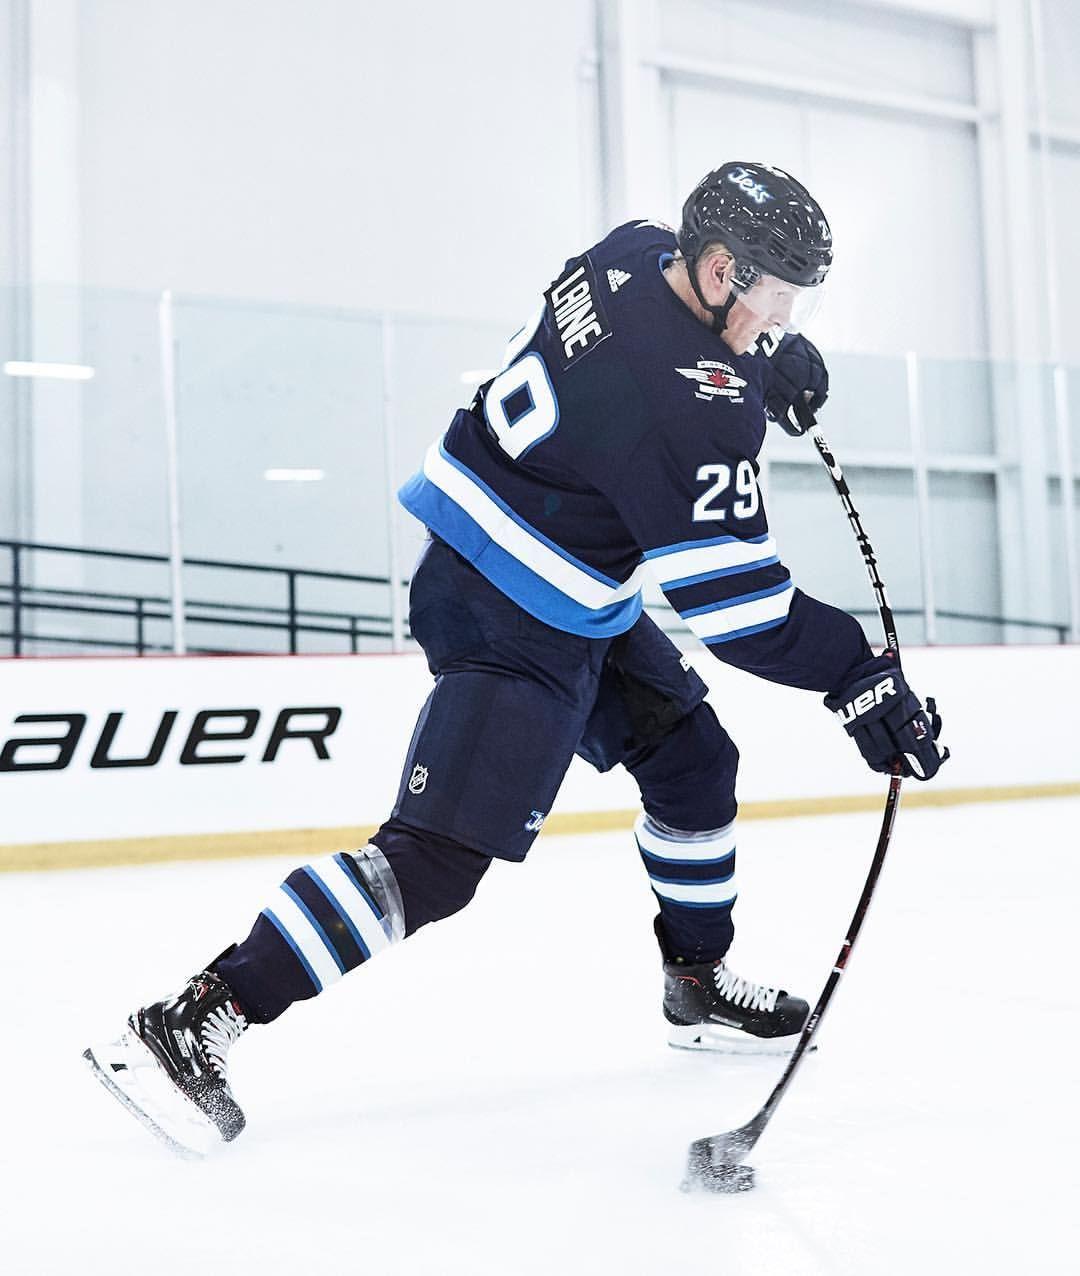 Bauer Hockey Pa Instagram Double Tap If You Miss Watching Patriklaine Shoot Pucks Flexfriday Hockey Hockey Fans Hockey Shot